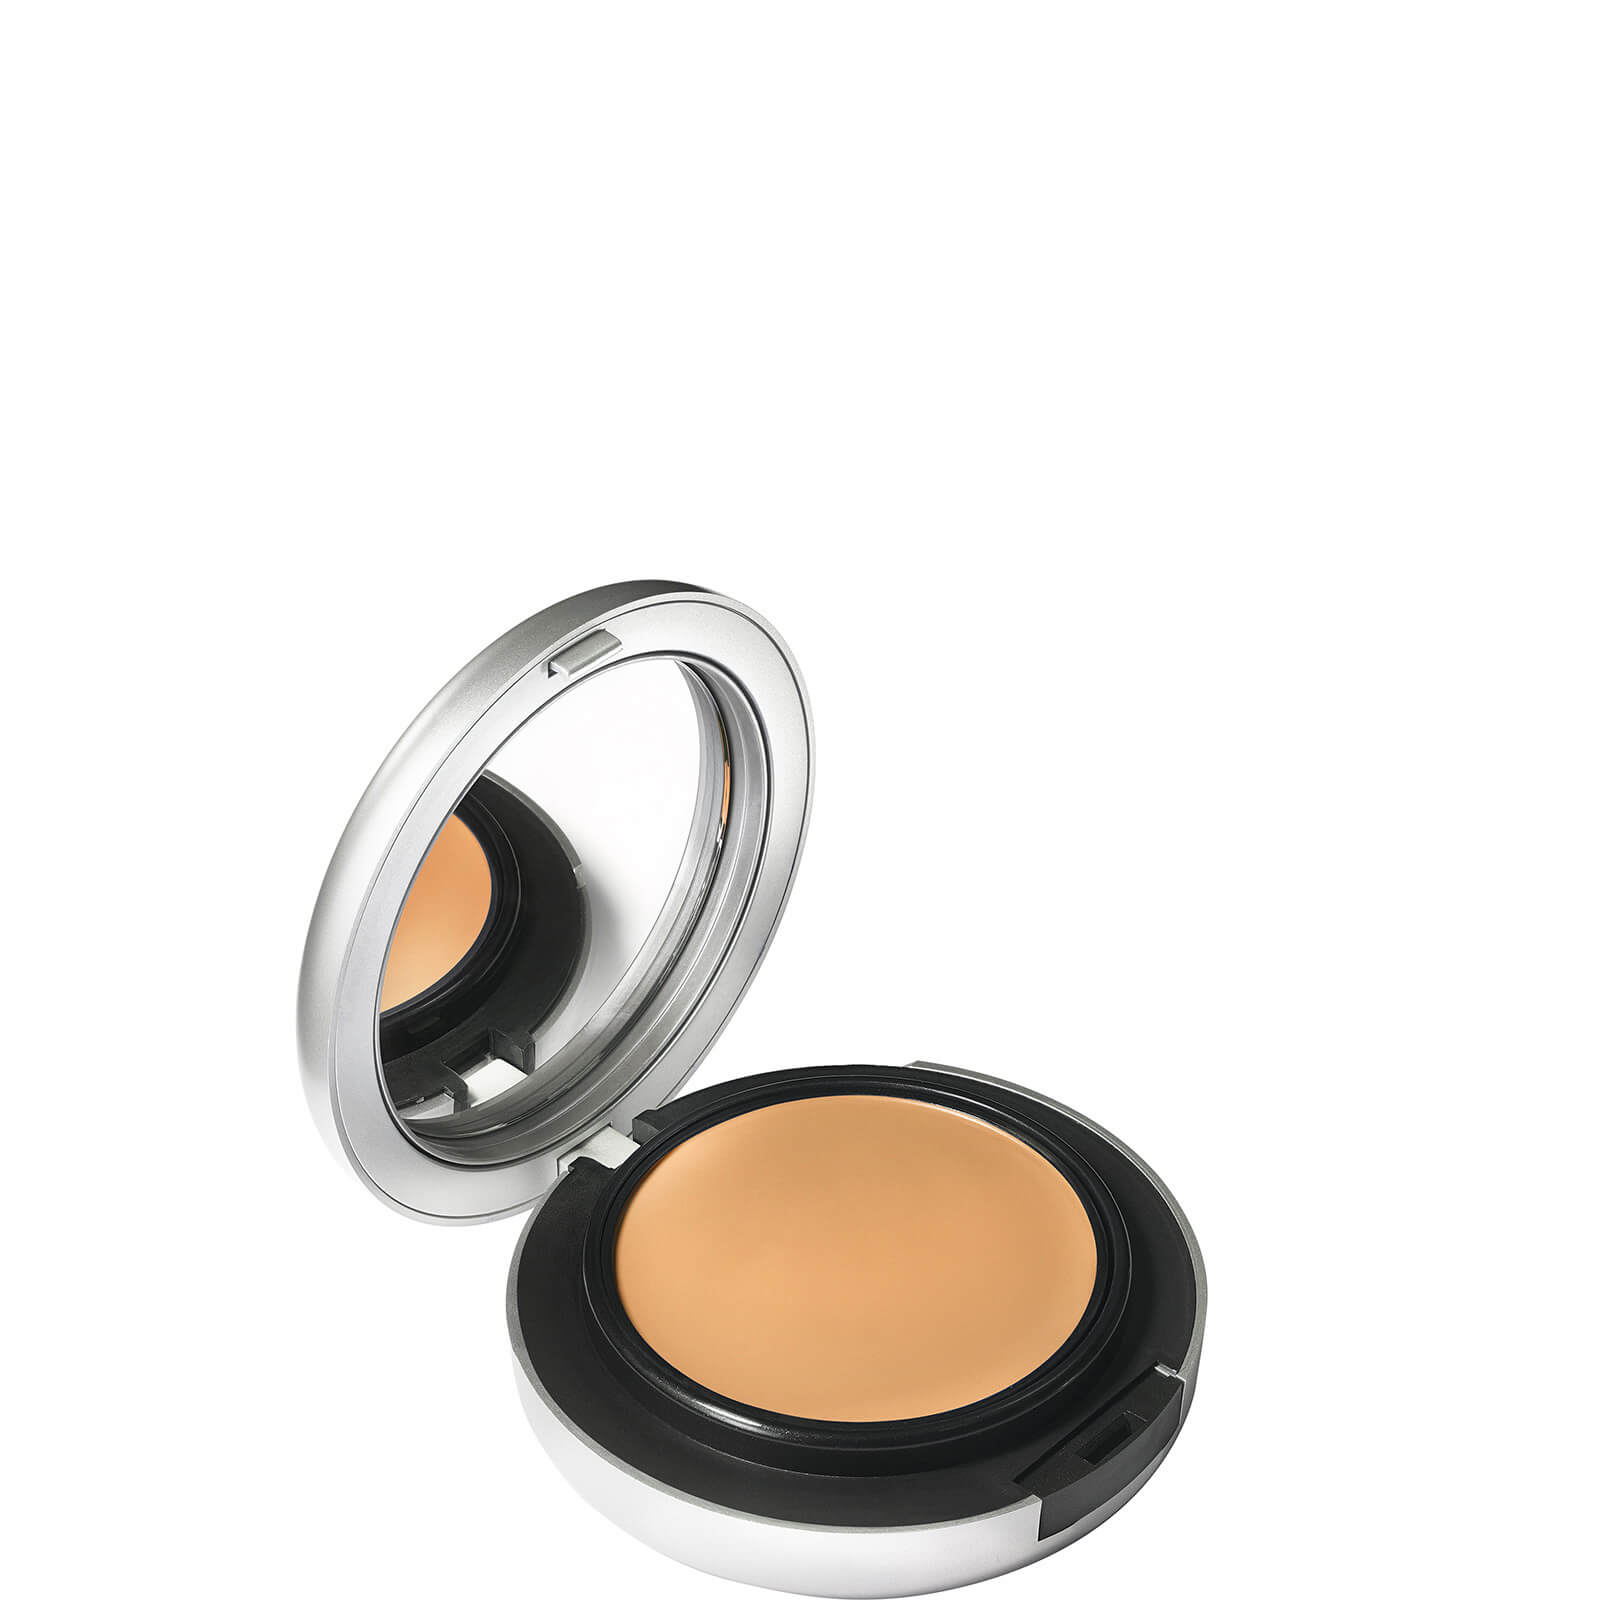 MAC Studio Fix Tech Cream-to-Powder Foundation 10g (Various Shades) - NC20